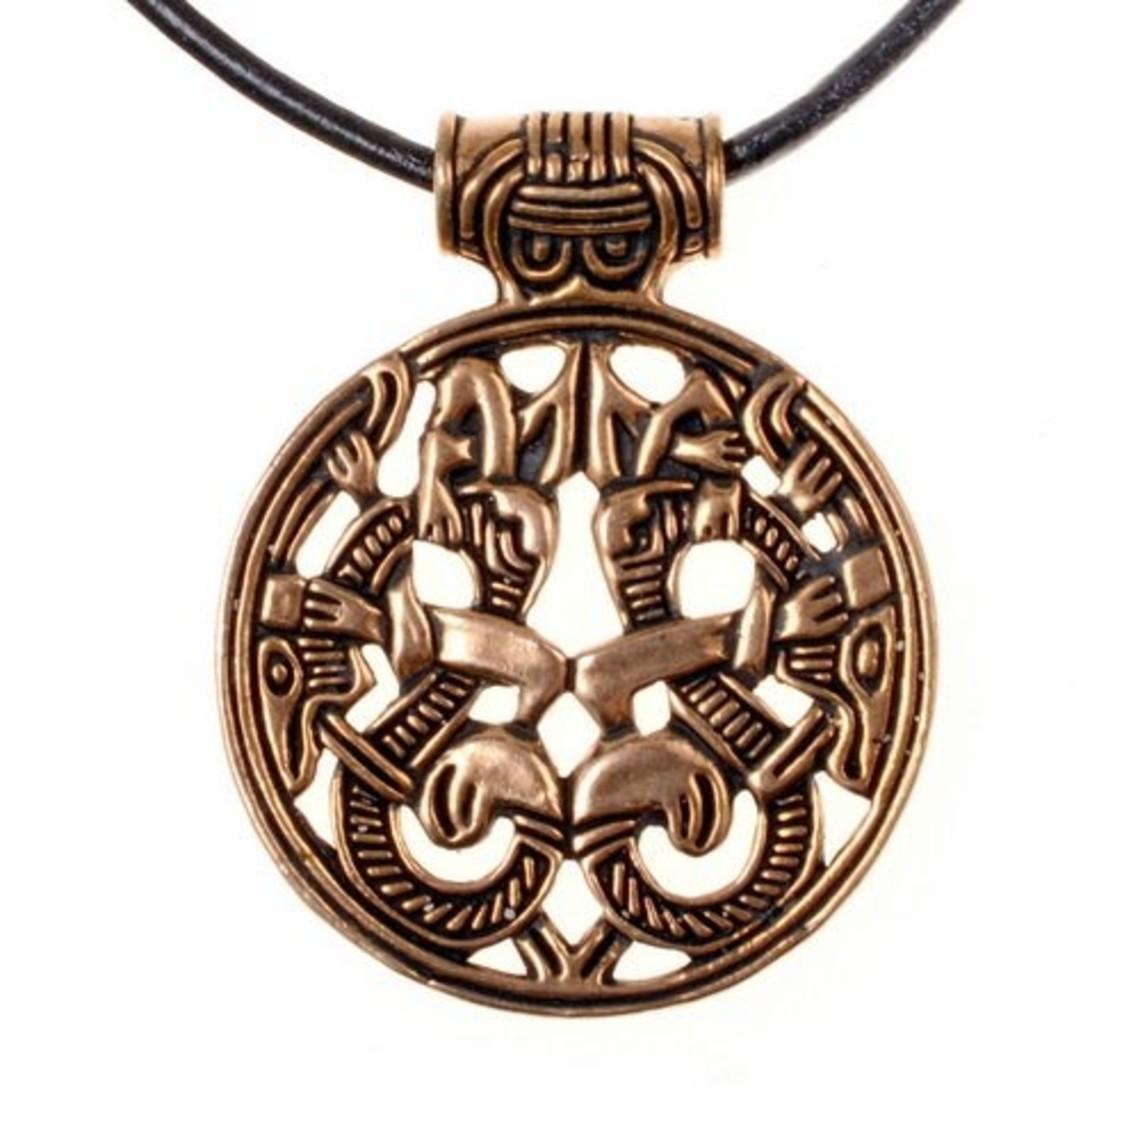 Varby Jellinge juvel, brons